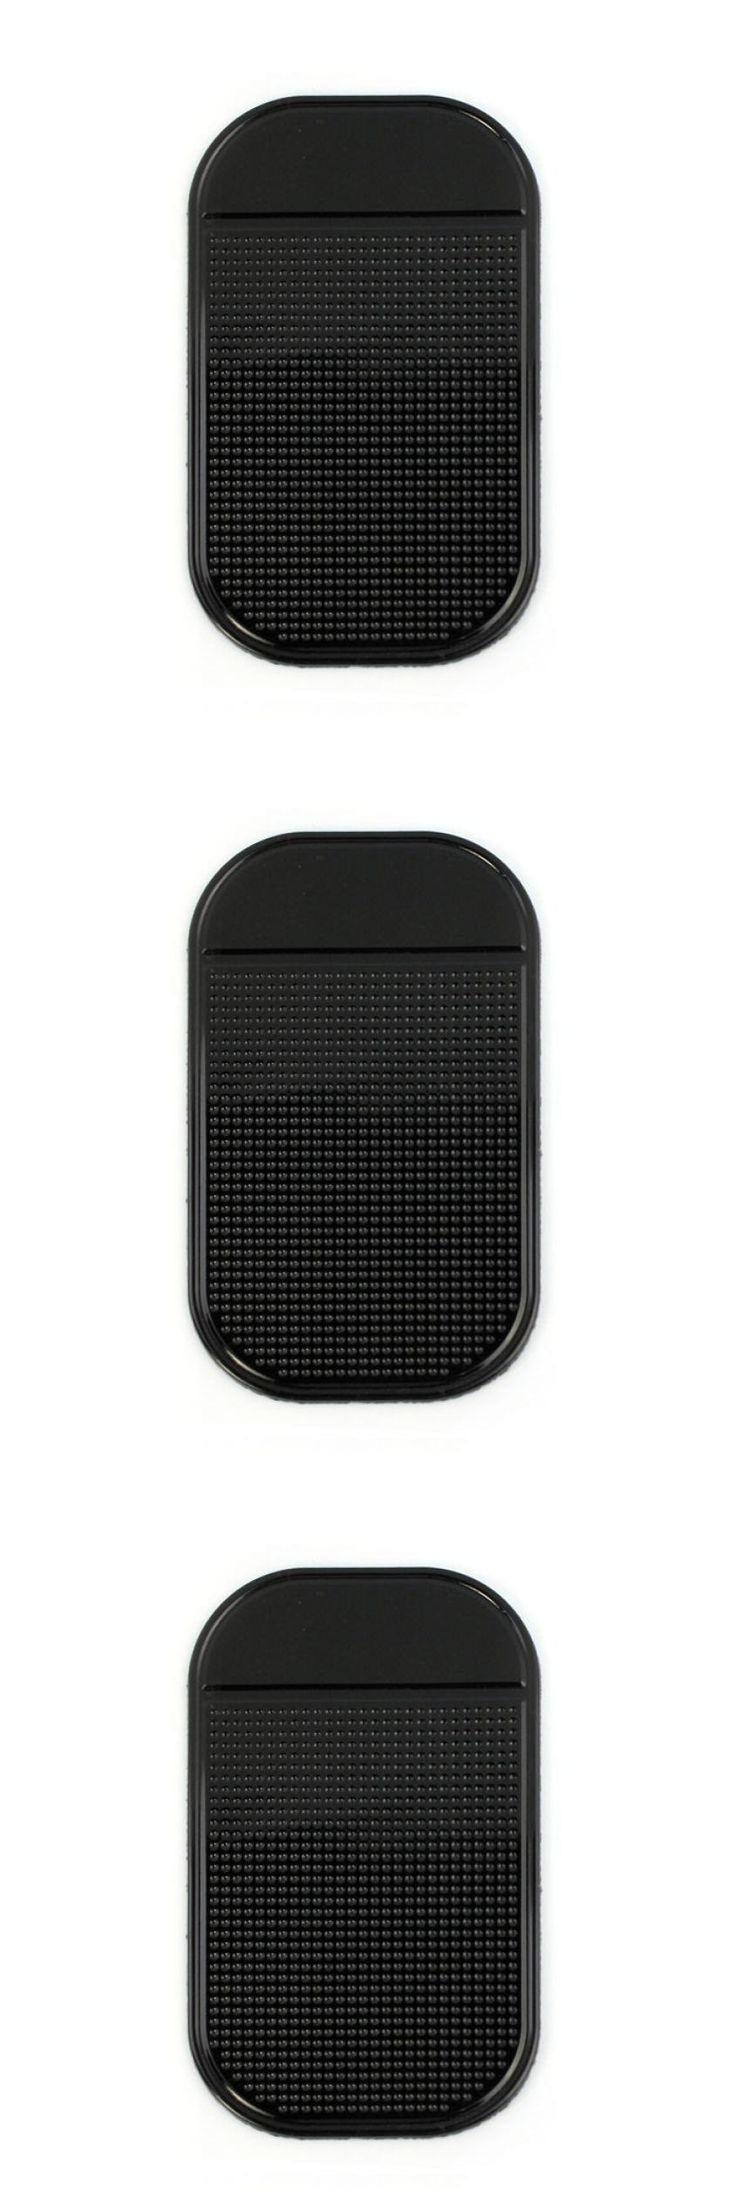 Car Anti-Slip Mat Dashboard Sticky Pad Non-slip Mat Holder For GPS Cell Phone Black Dropshipping Aug9